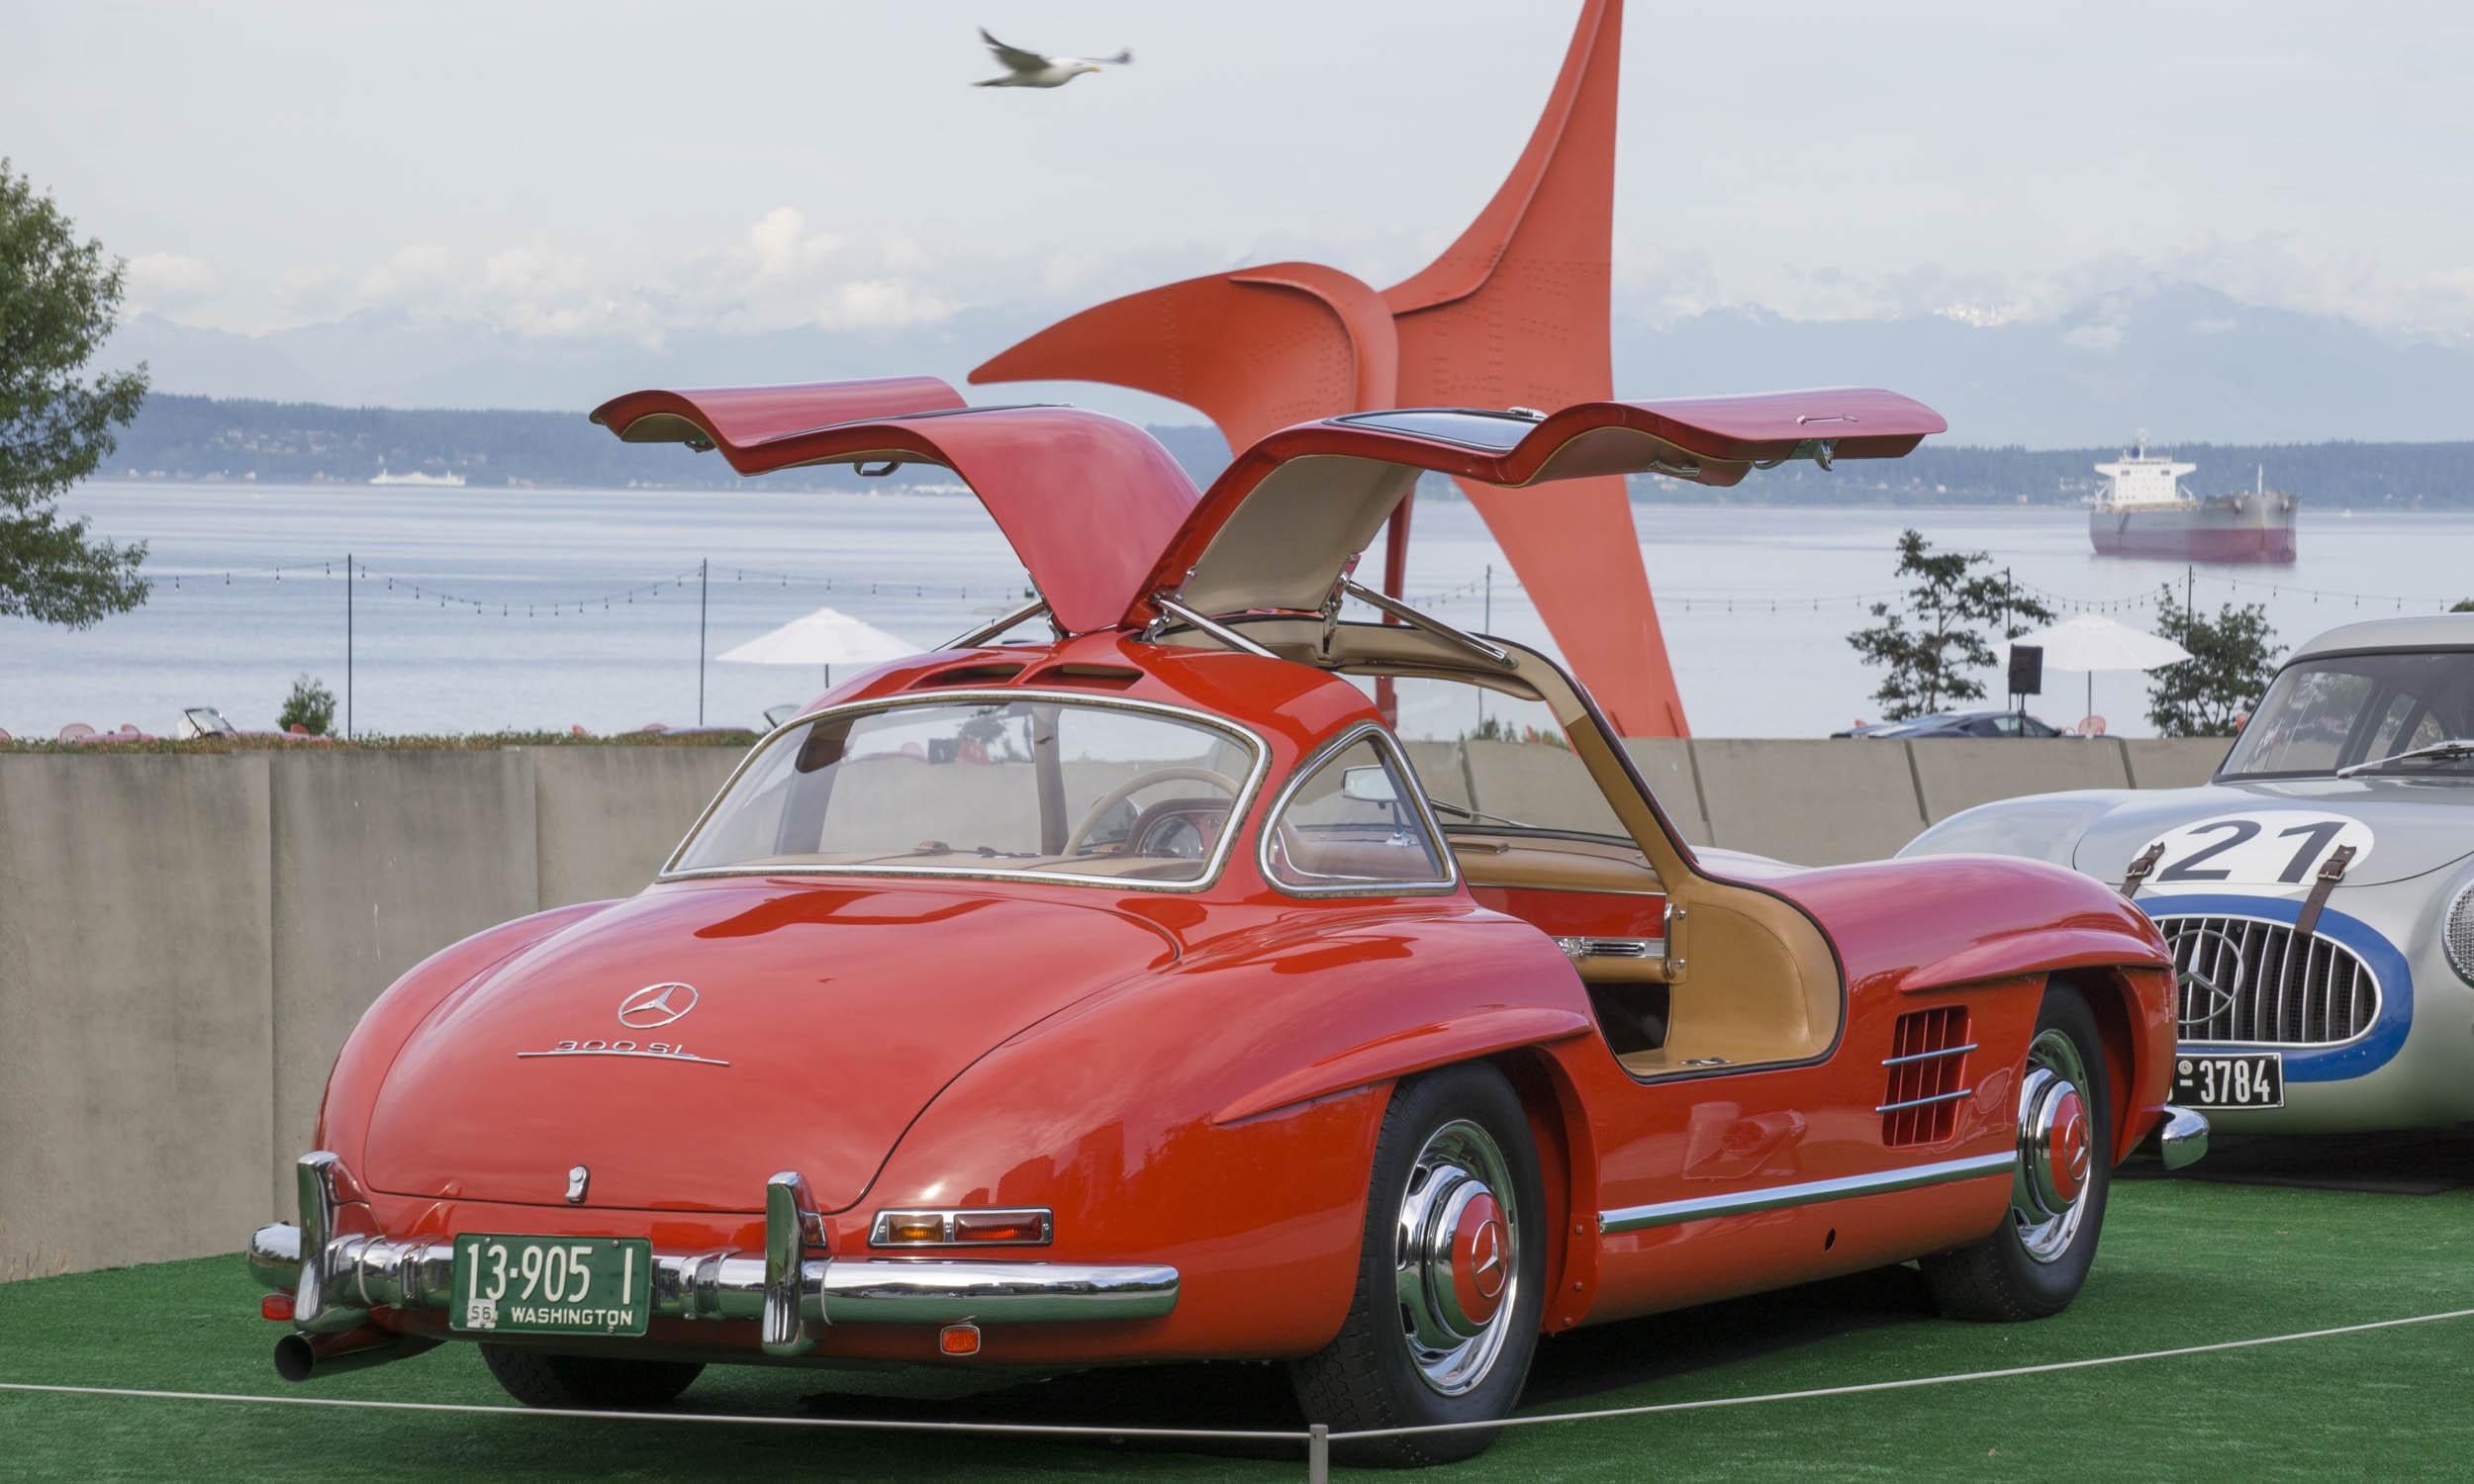 Auto Art Exclusive Extraordinary Cars in Seattlenbsp